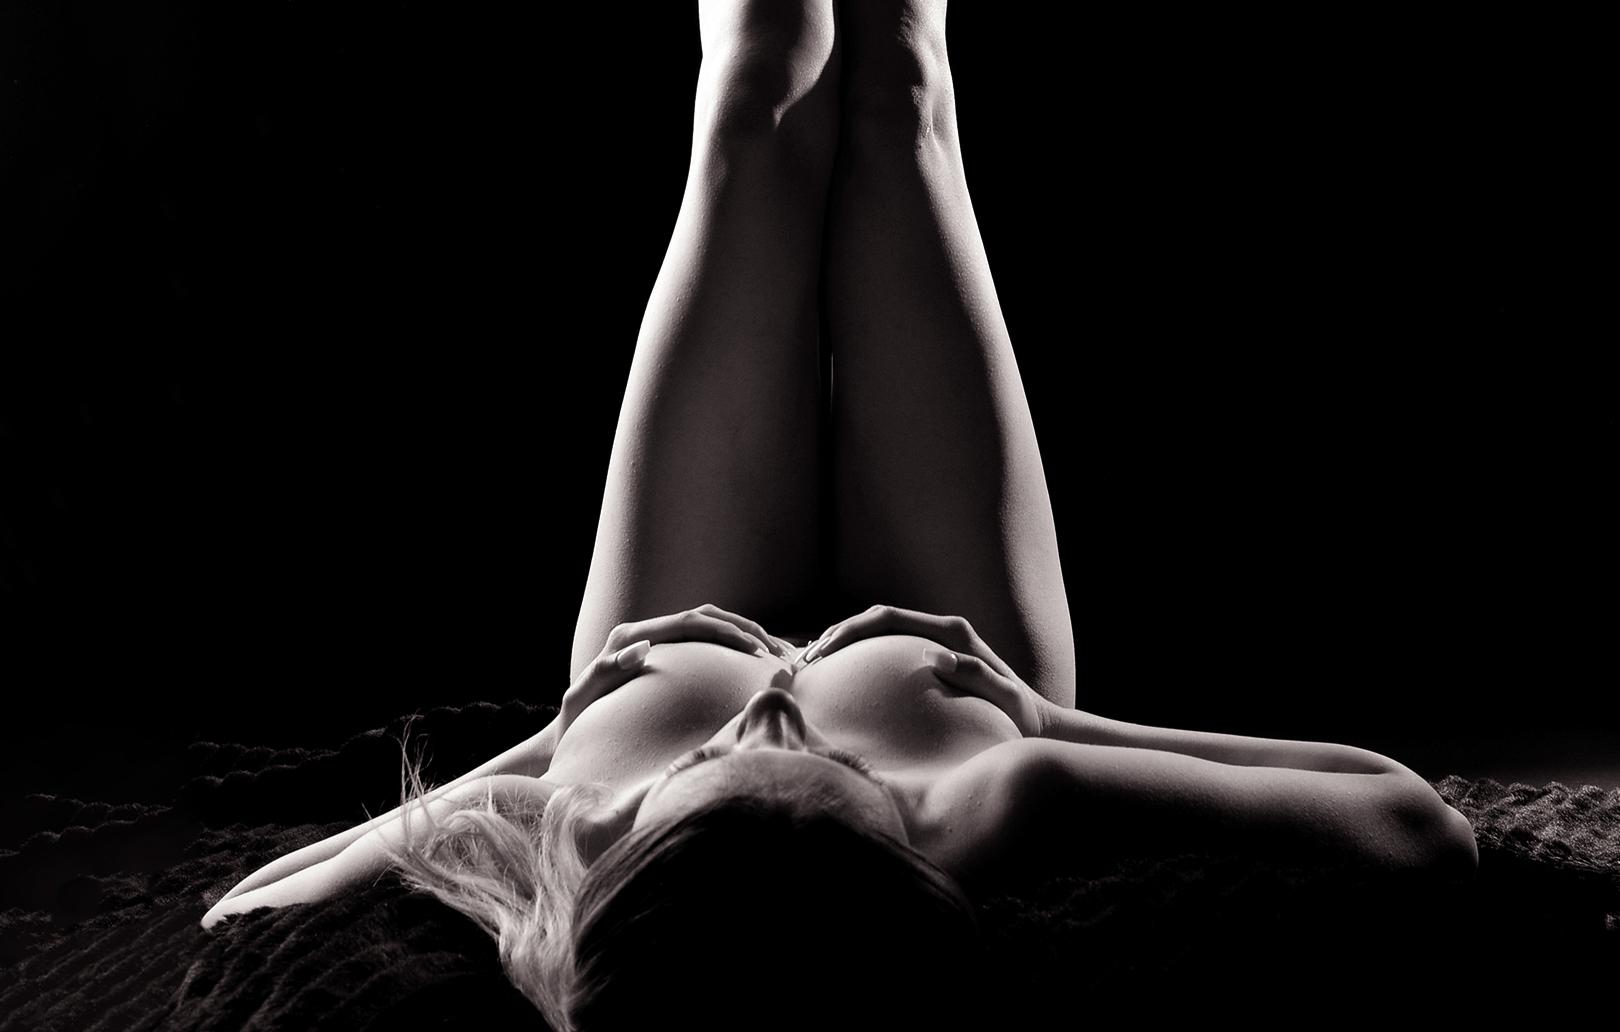 erotisches-fotoshooting-koeln-bg31610532066